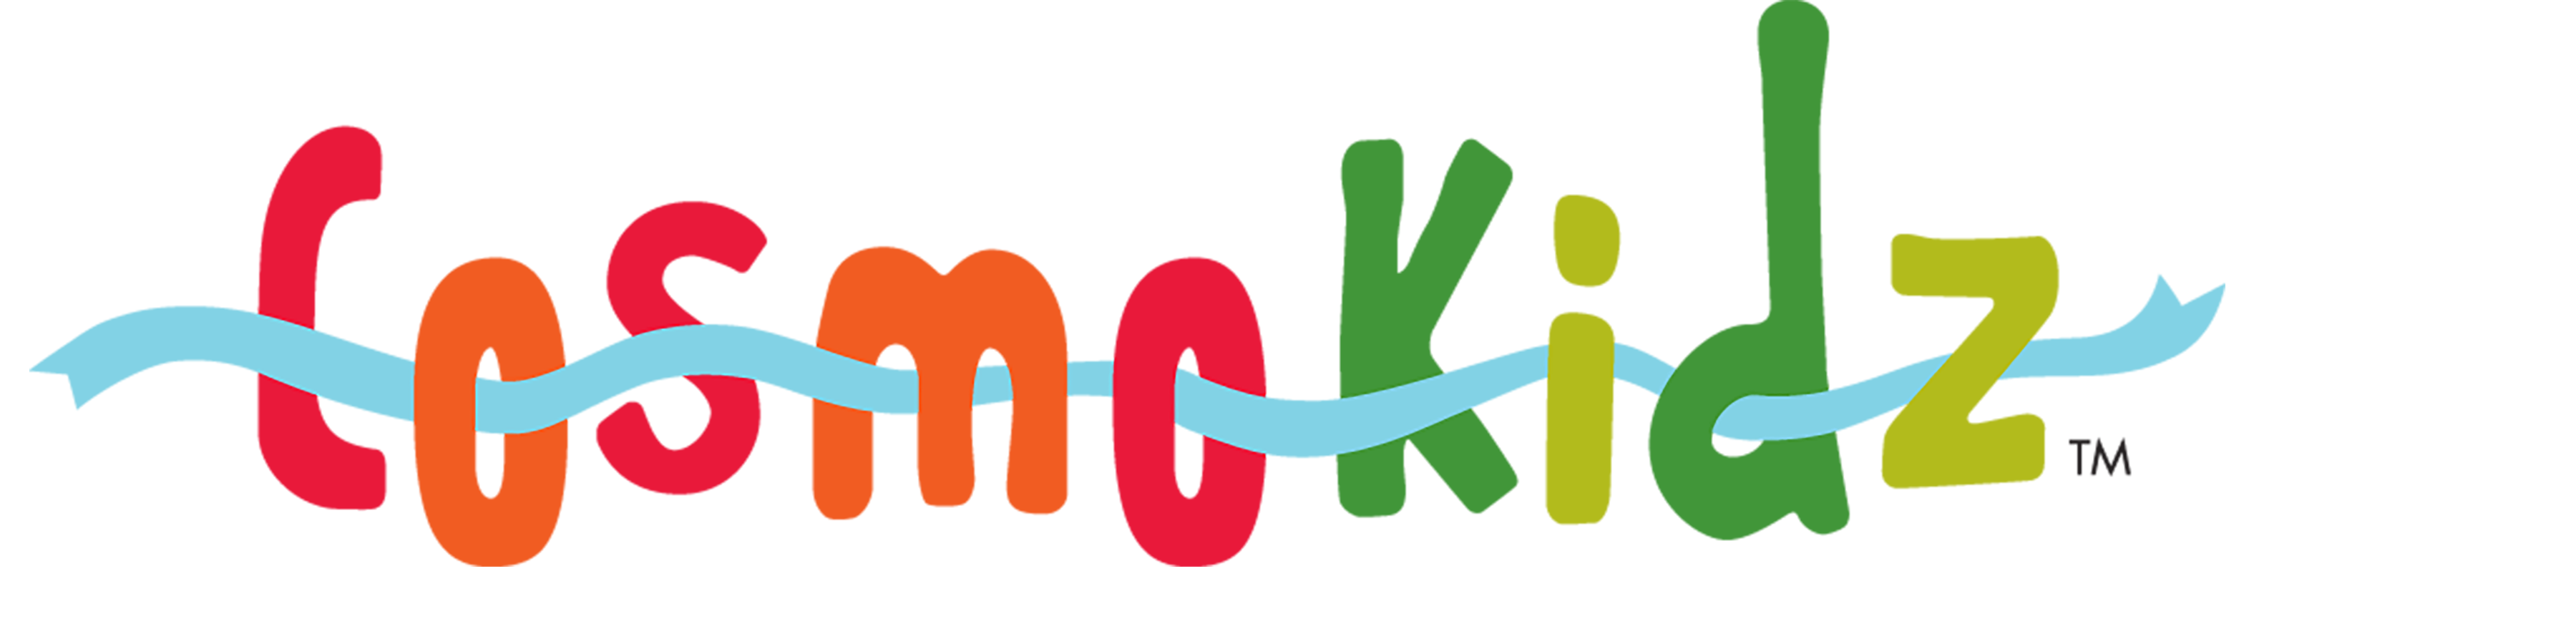 CosmoKidz TM logo